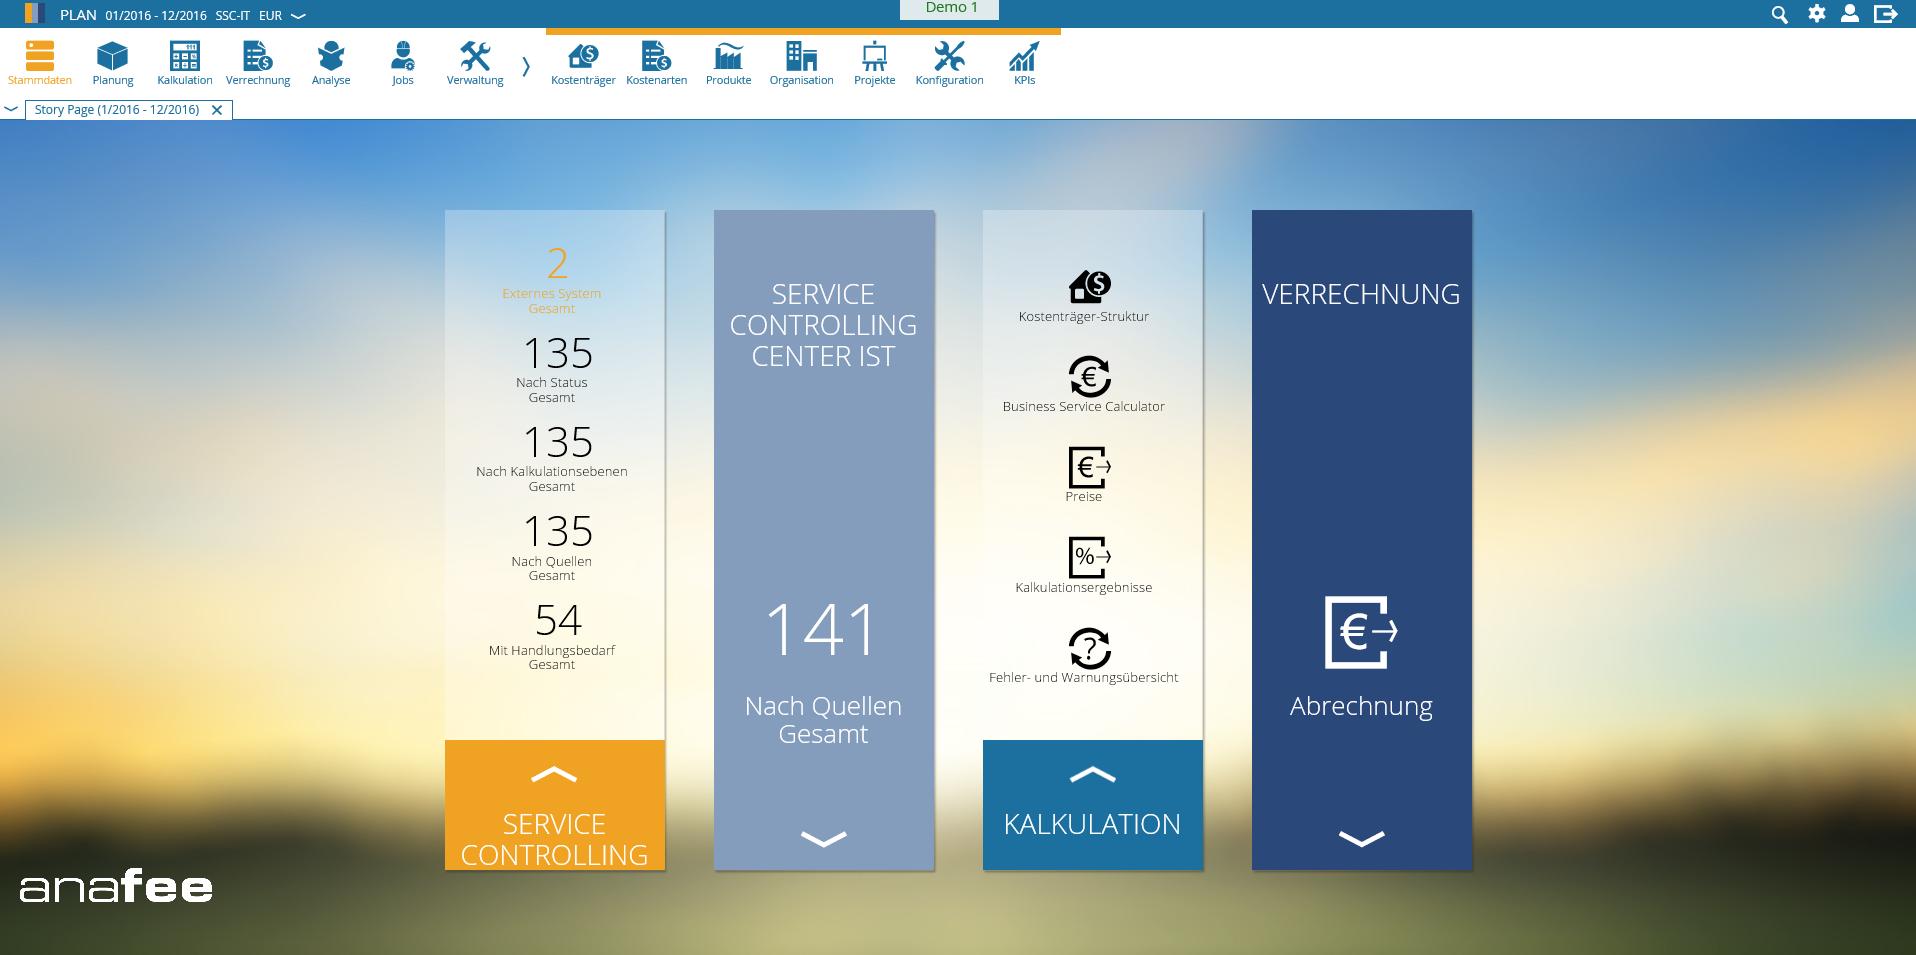 anafee 5.3 dashboard